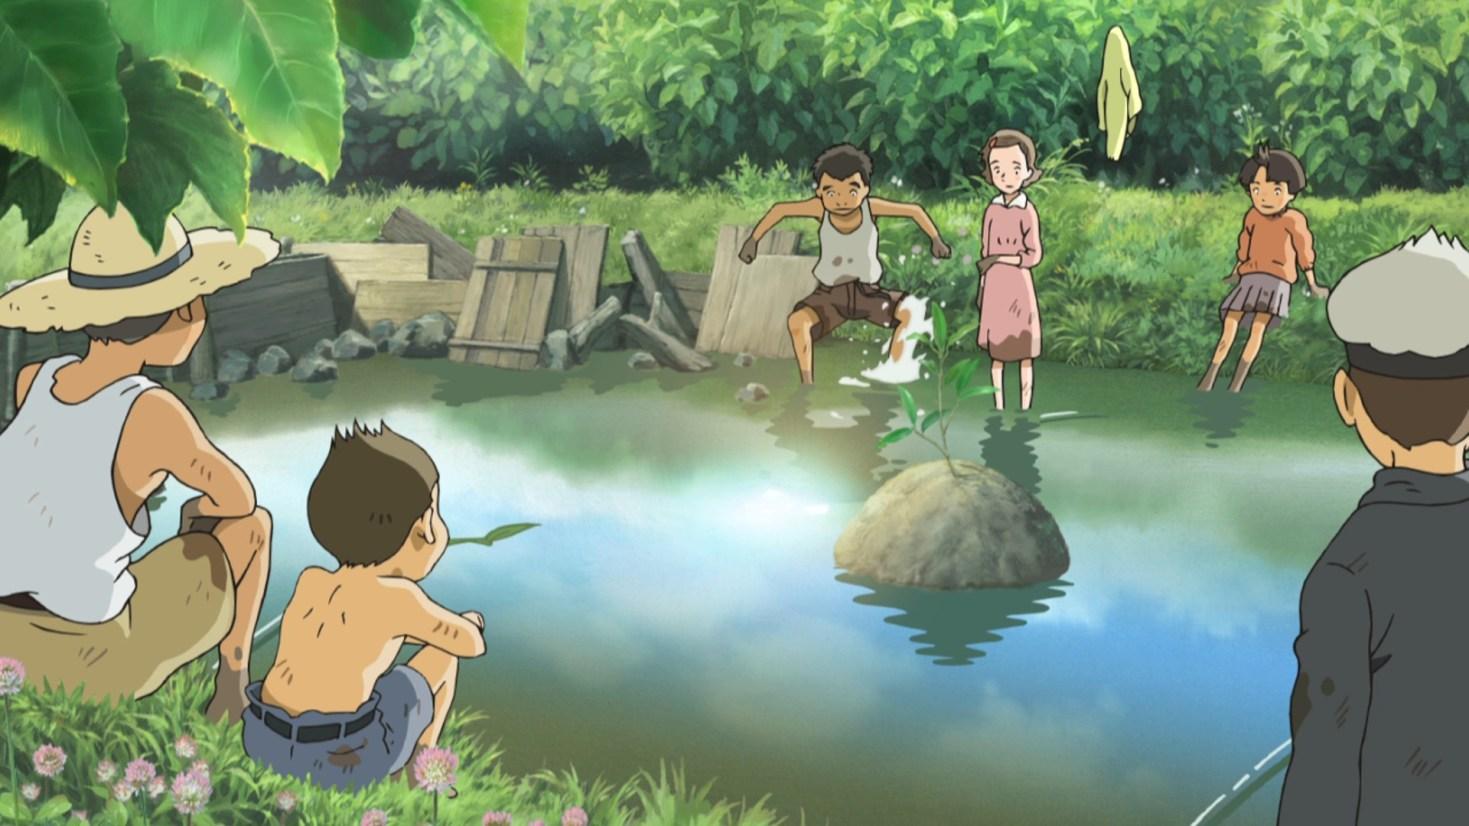 Maimai miracle – Sunao Katabushi